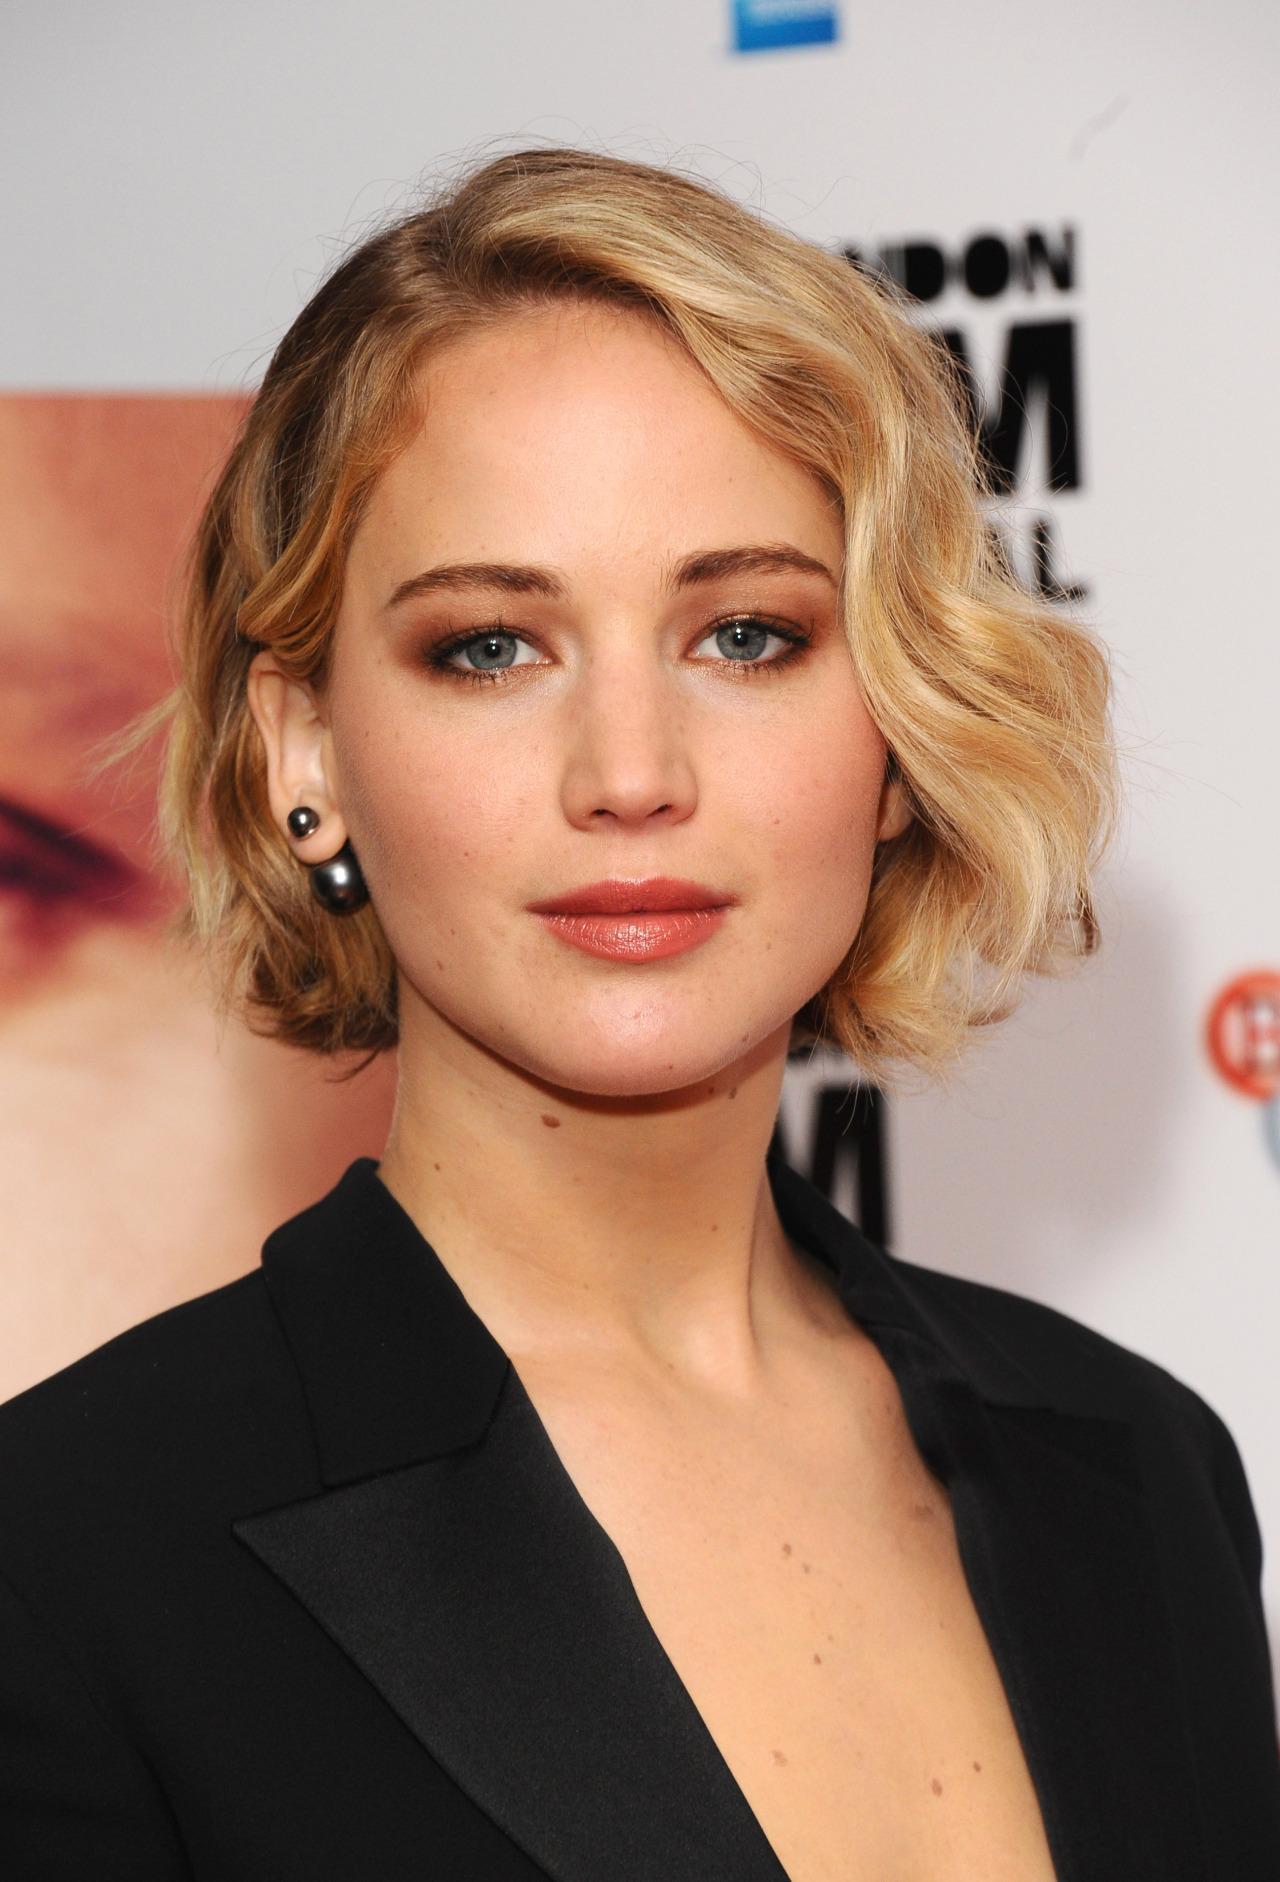 Jennifer Lawrences leaked nude photo culprit speaks out